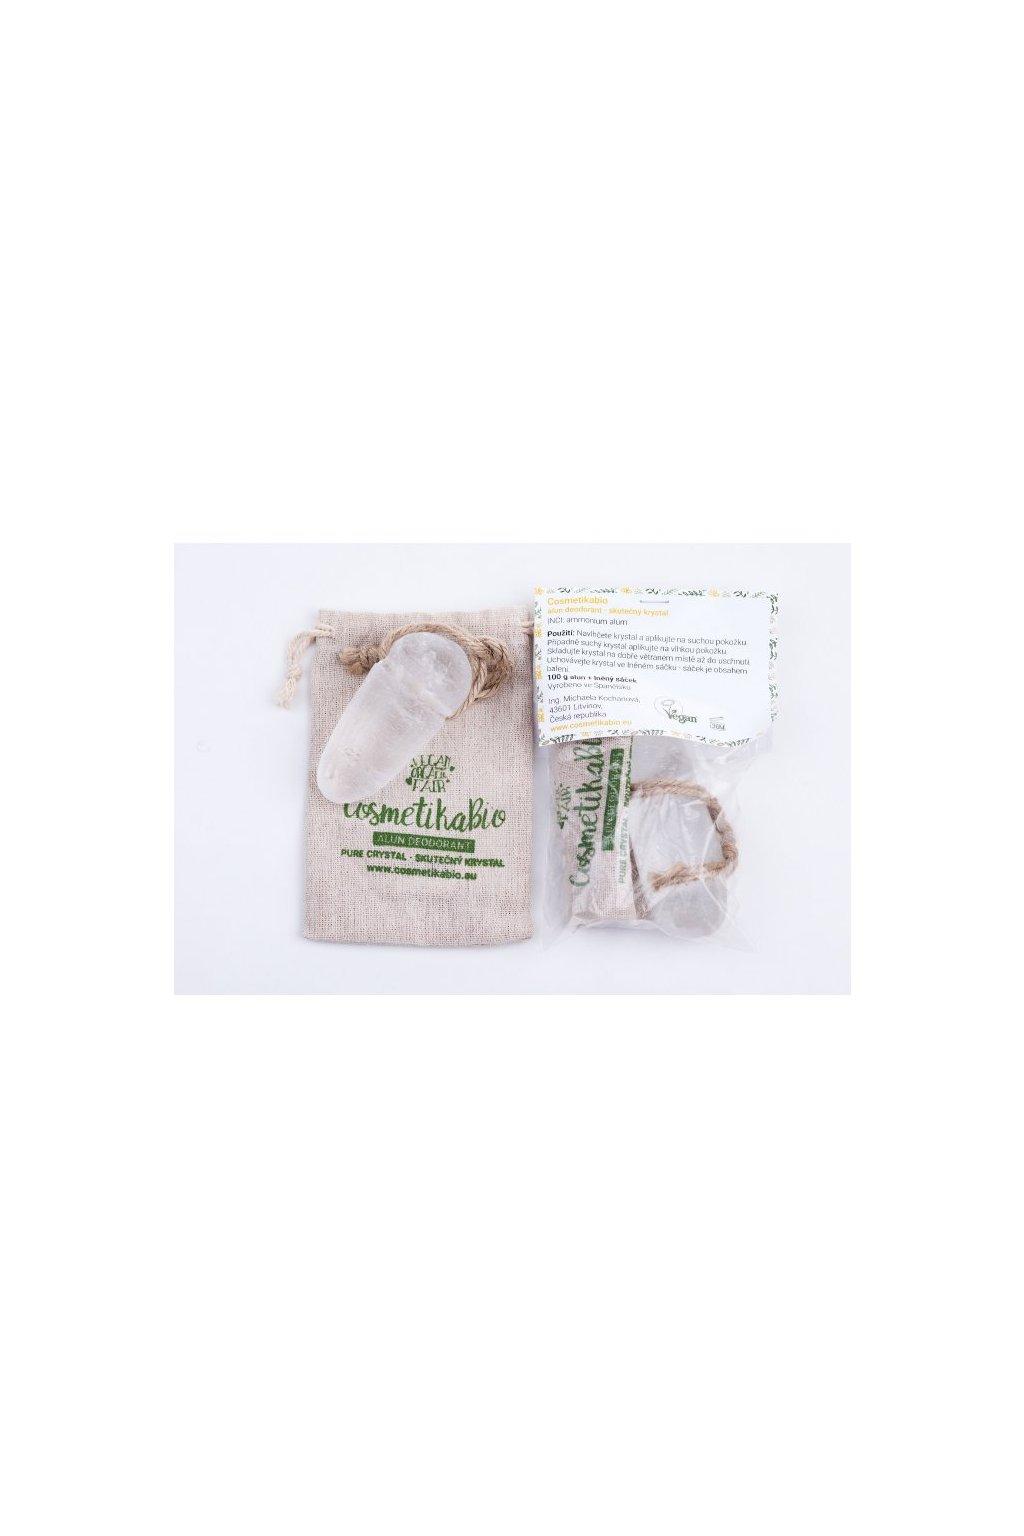 99 1 cosmetikabio alun prirodni deodorant kamenec(1)